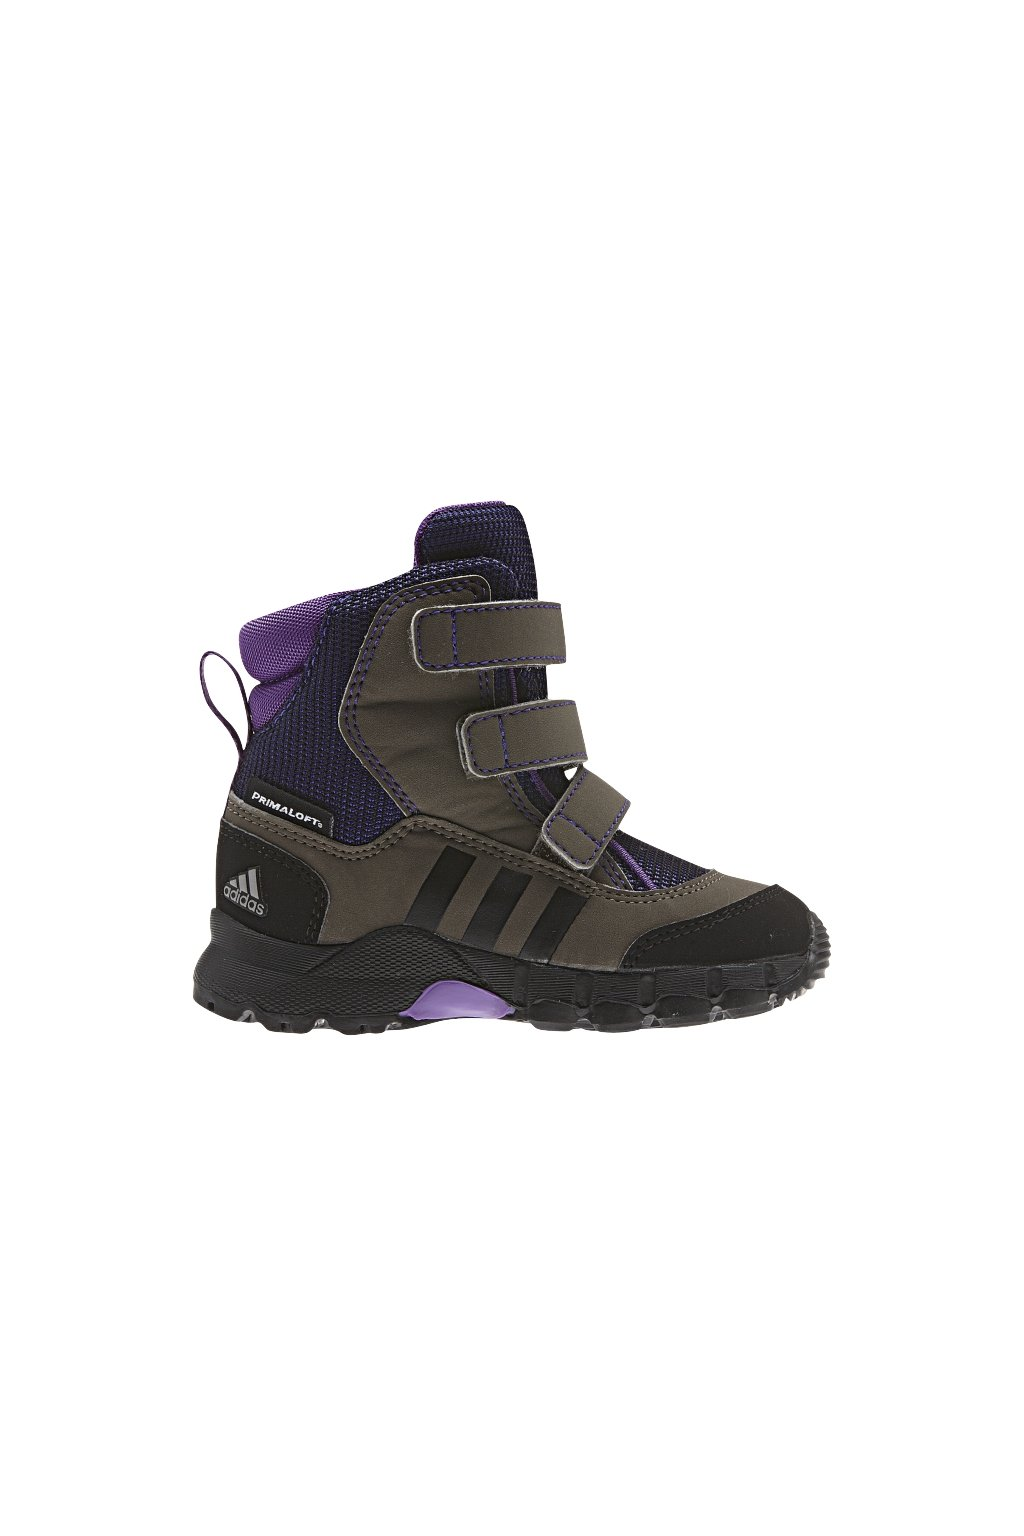 adidas HOLTANNA SNOW CF PL I G97266